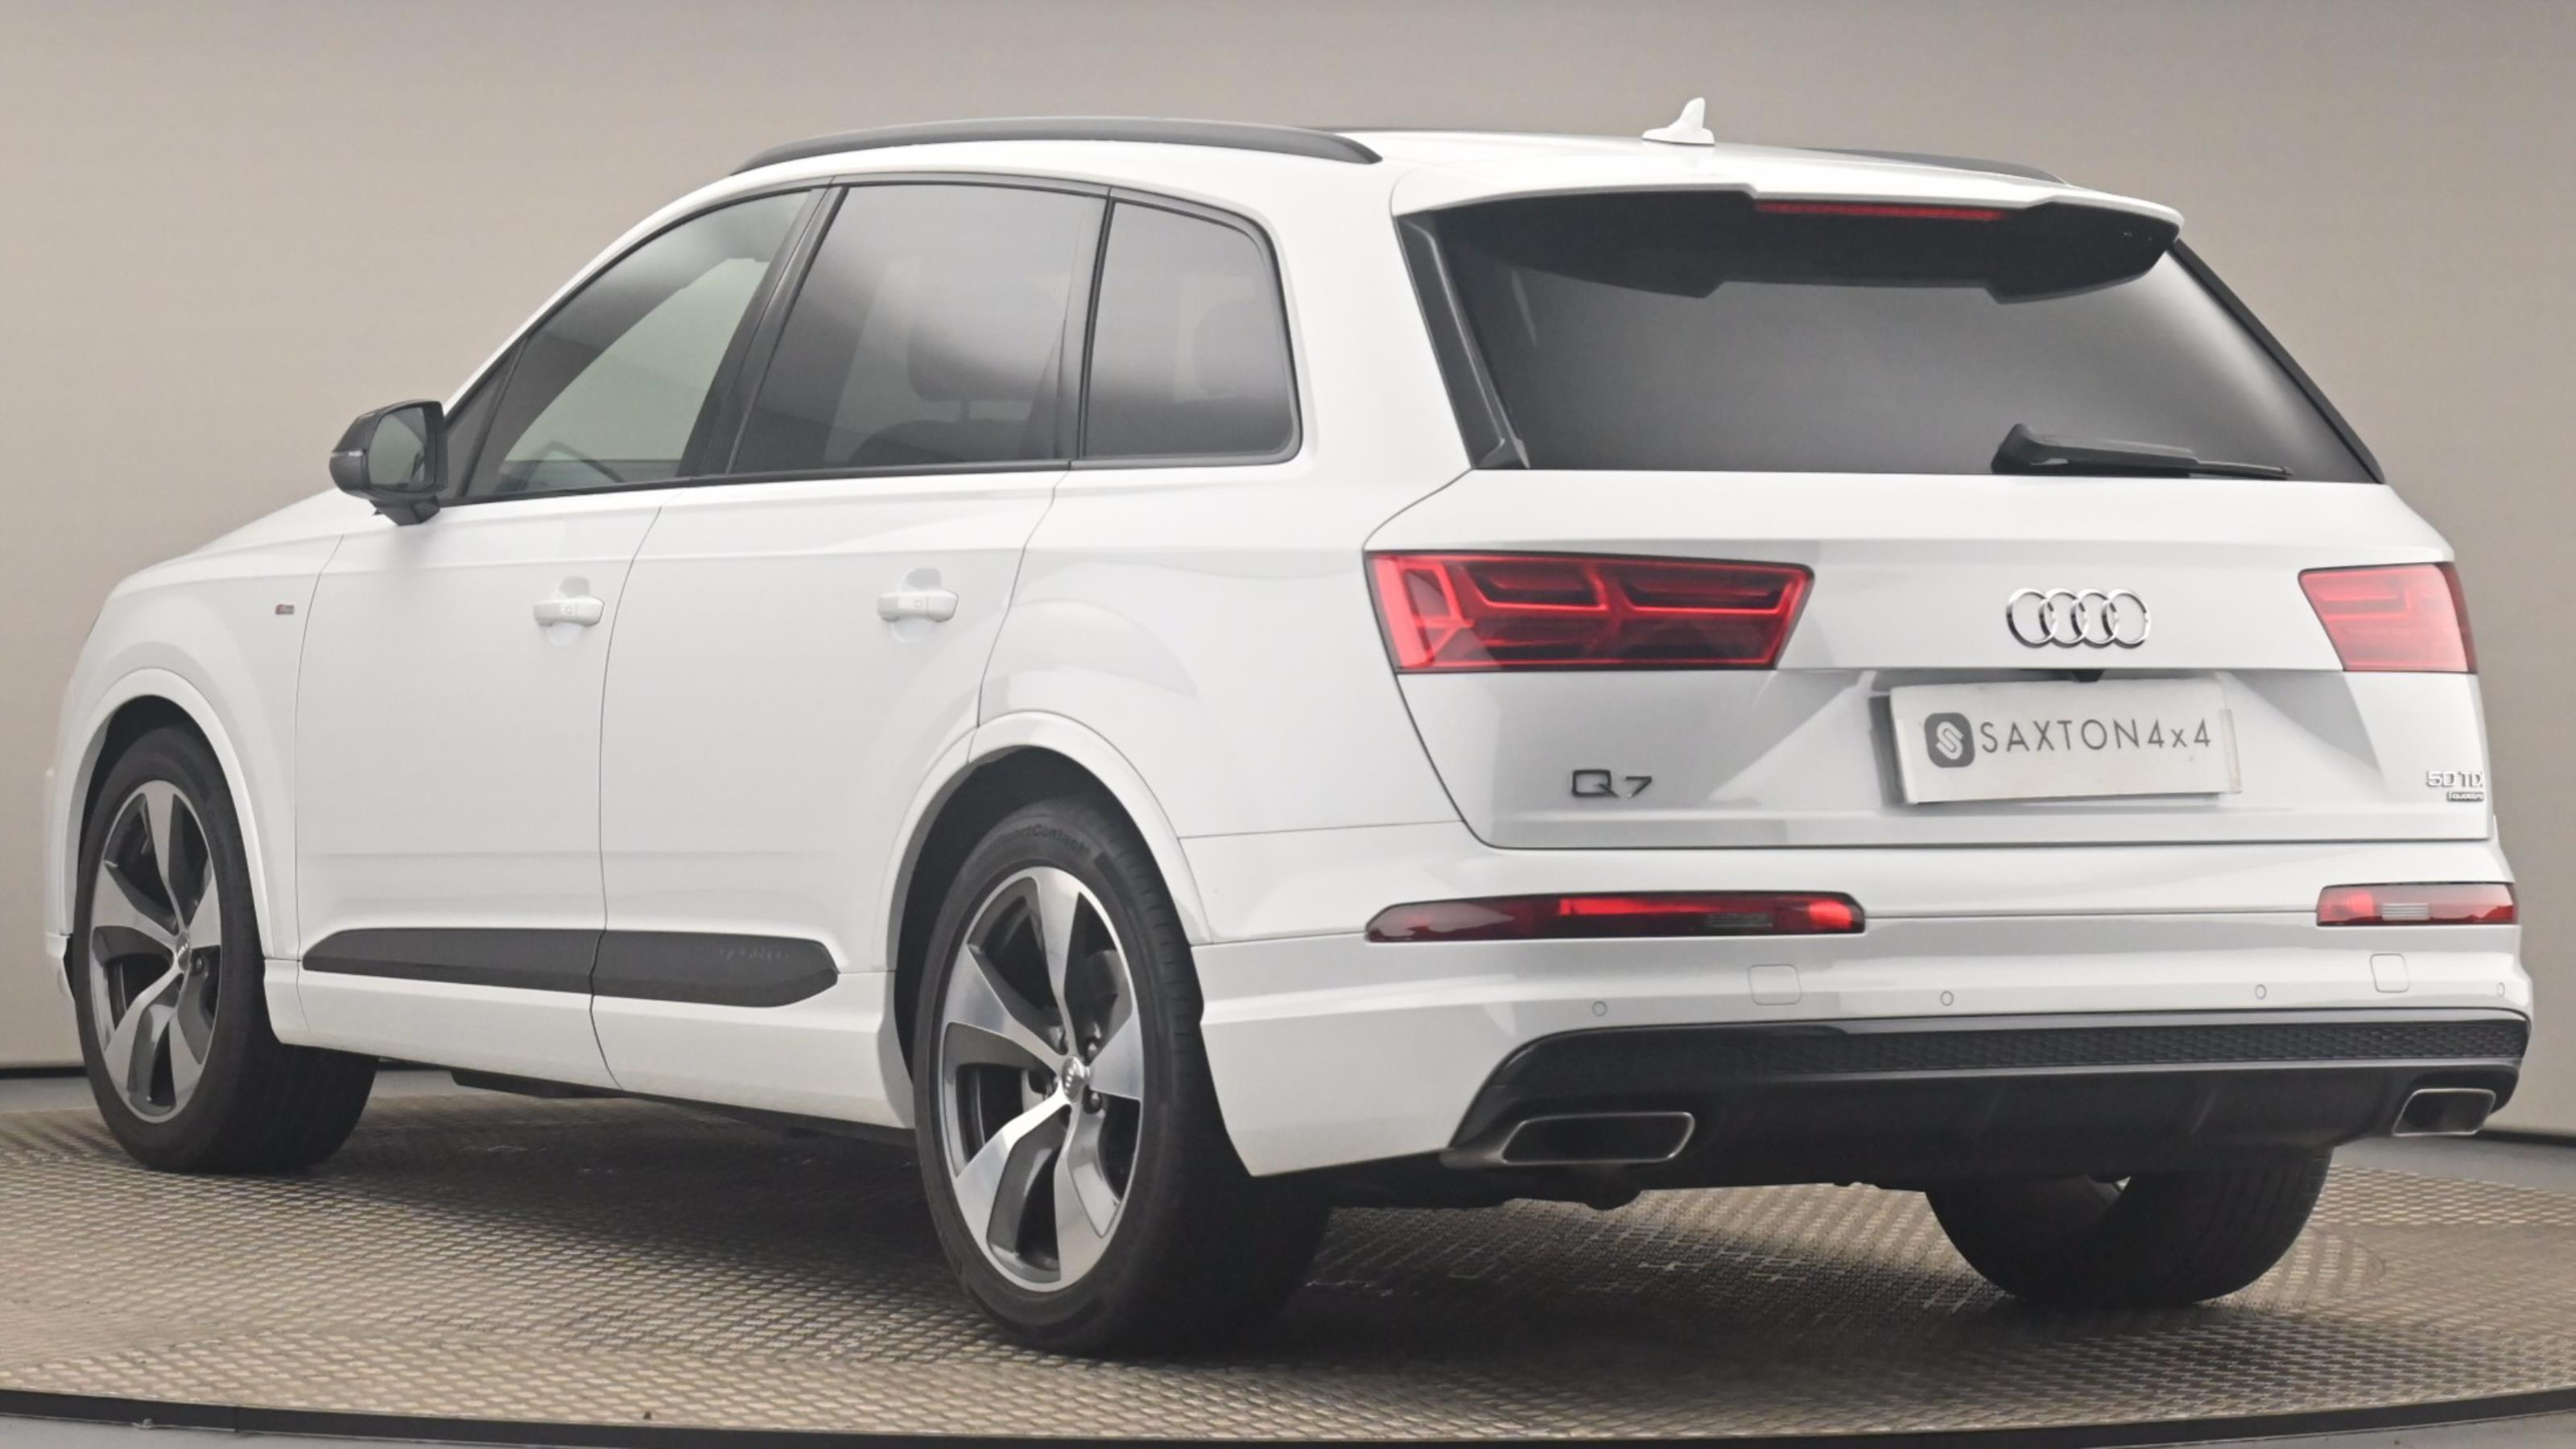 Used ~ Audi Q7 S Line Black Ed Tdi Qu Glacier White Metallic at Saxton4x4